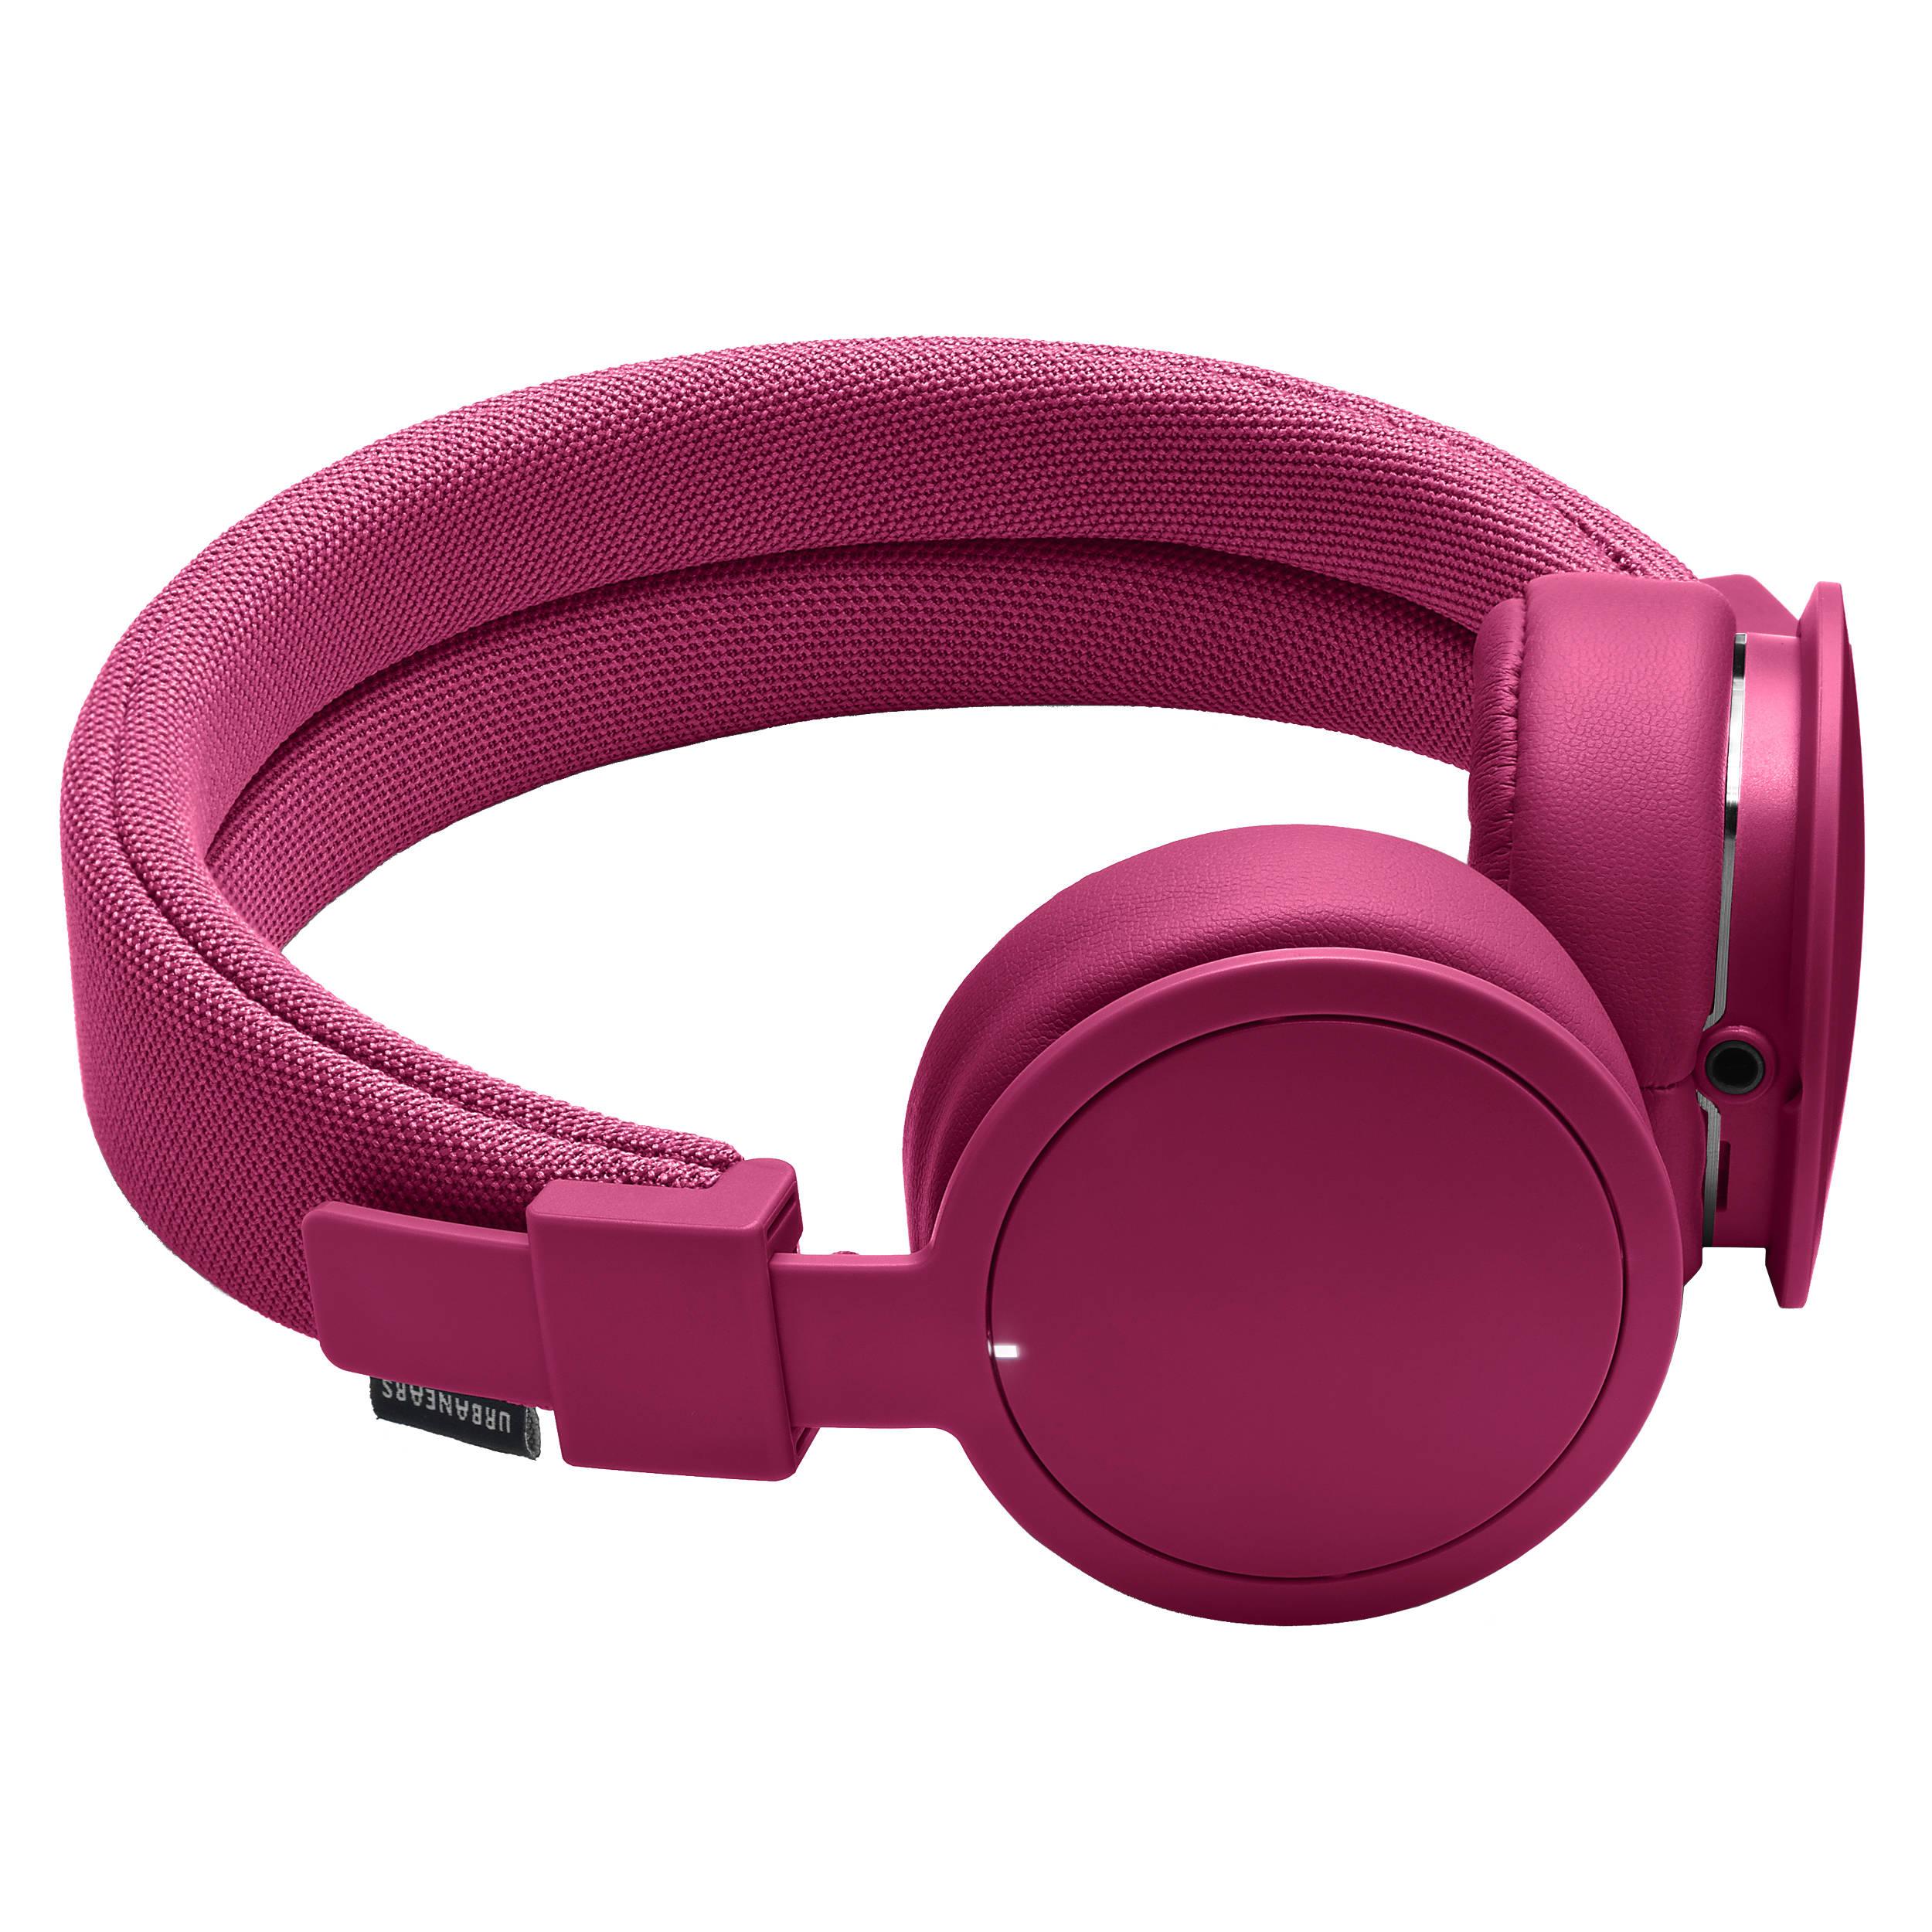 b1ceef3a5d2 urbanears_4091105_plattan_adv_wireless_headphones_1186135.jpg